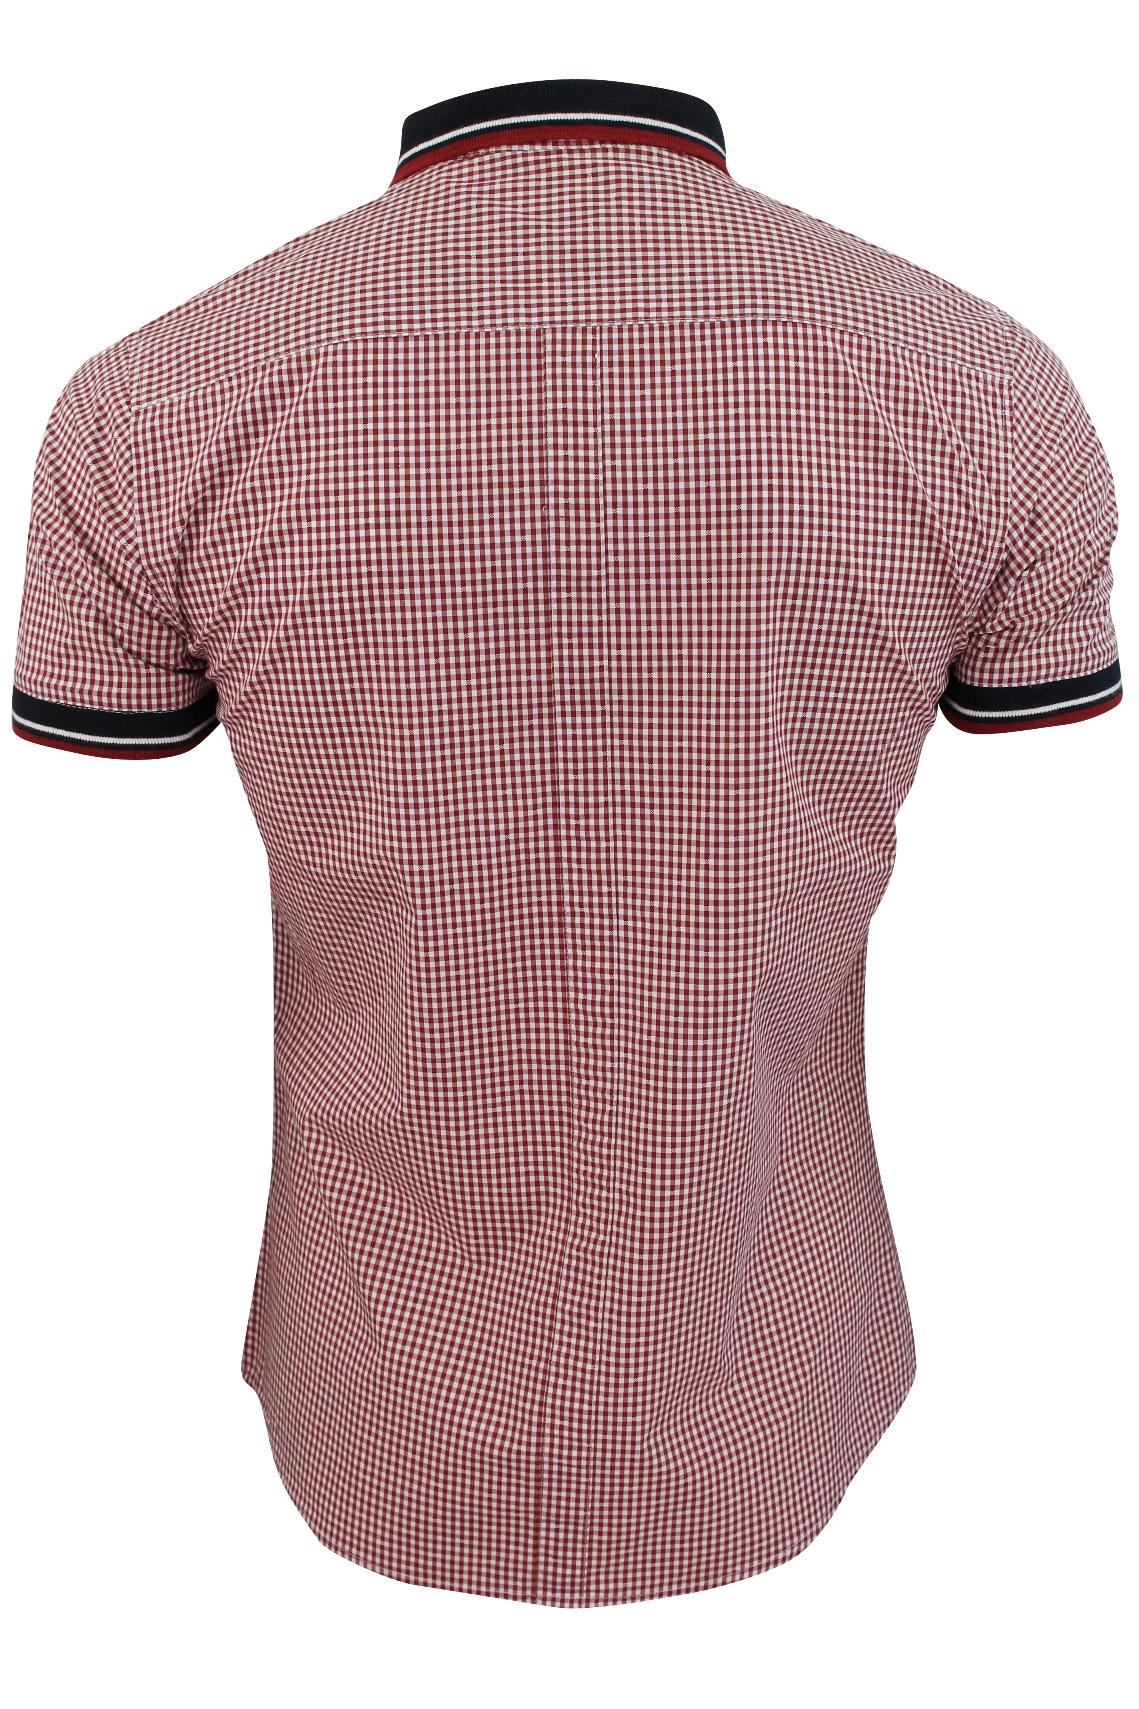 Mens-Shirt-by-Le-Shark-039-Bohemian-039-Gingham-Check thumbnail 5